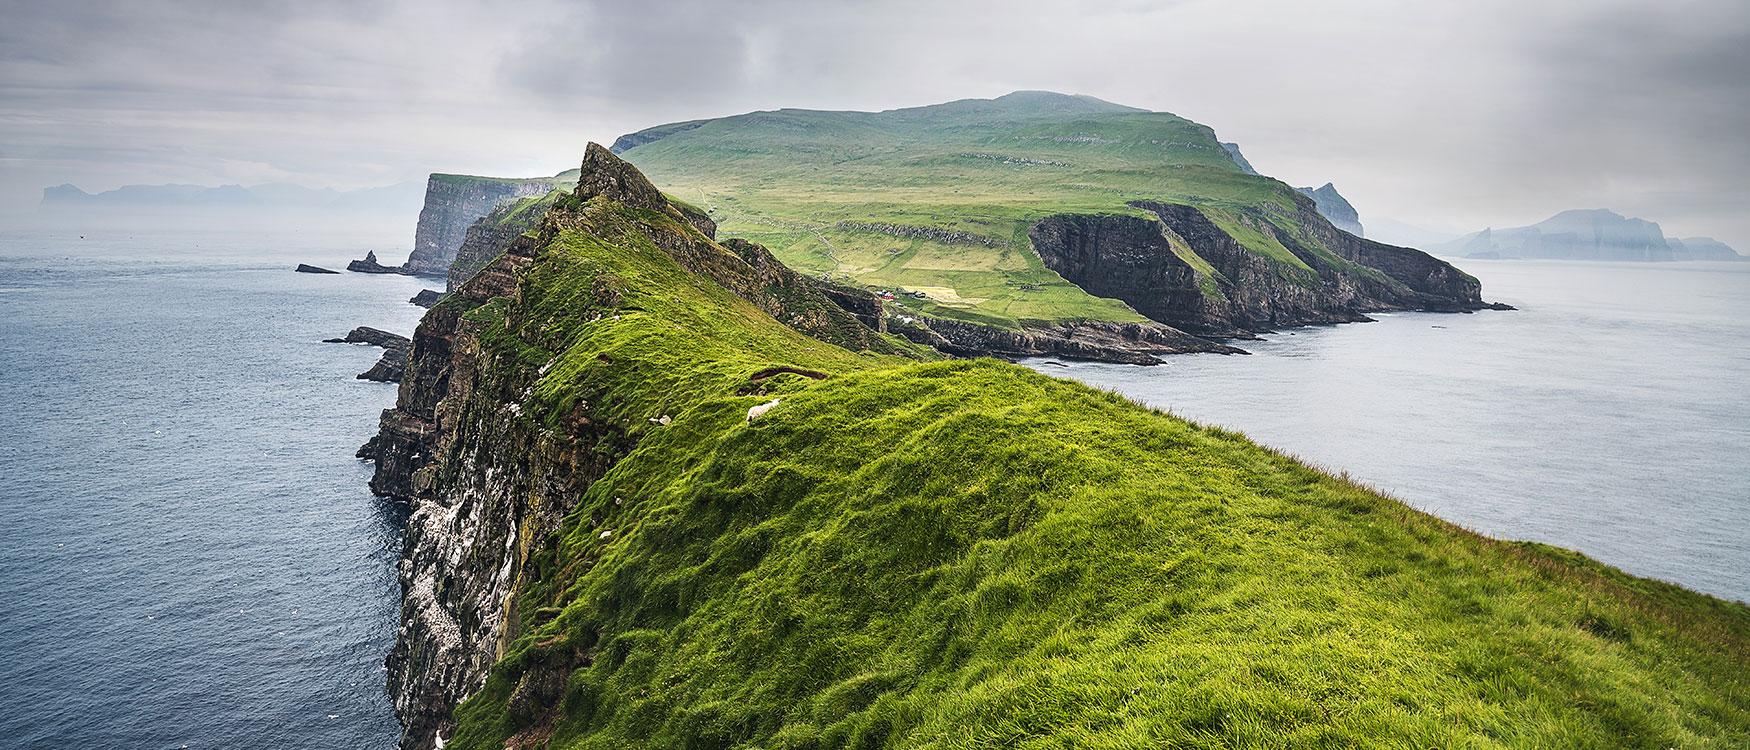 Natur Insel Mykines Färöer Inseln